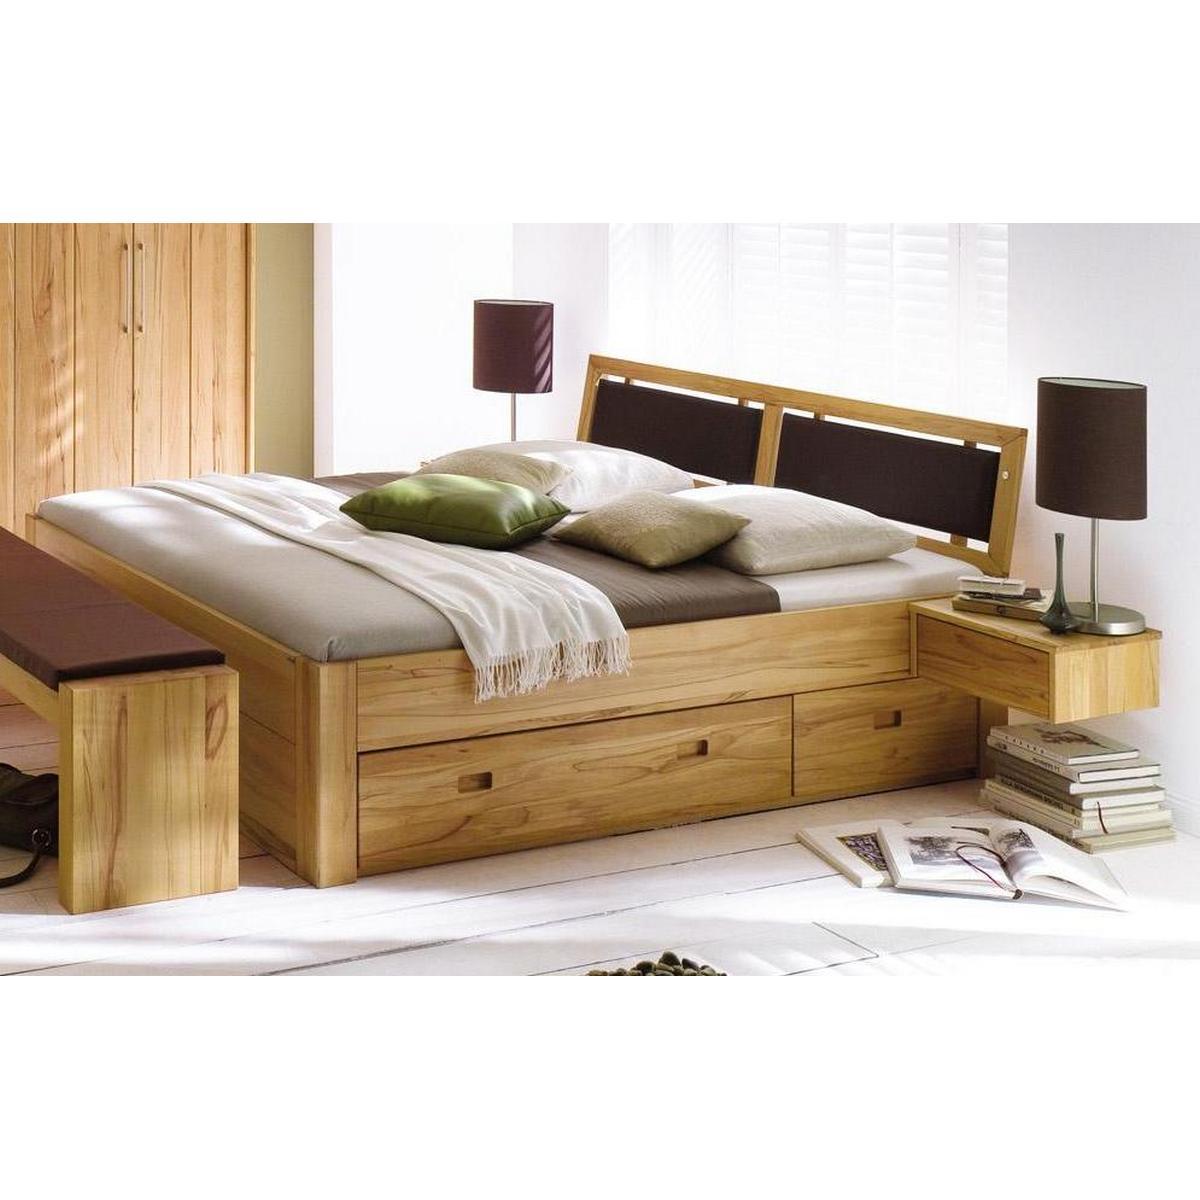 sitzbank schlafzimmer schweiz inspiration. Black Bedroom Furniture Sets. Home Design Ideas